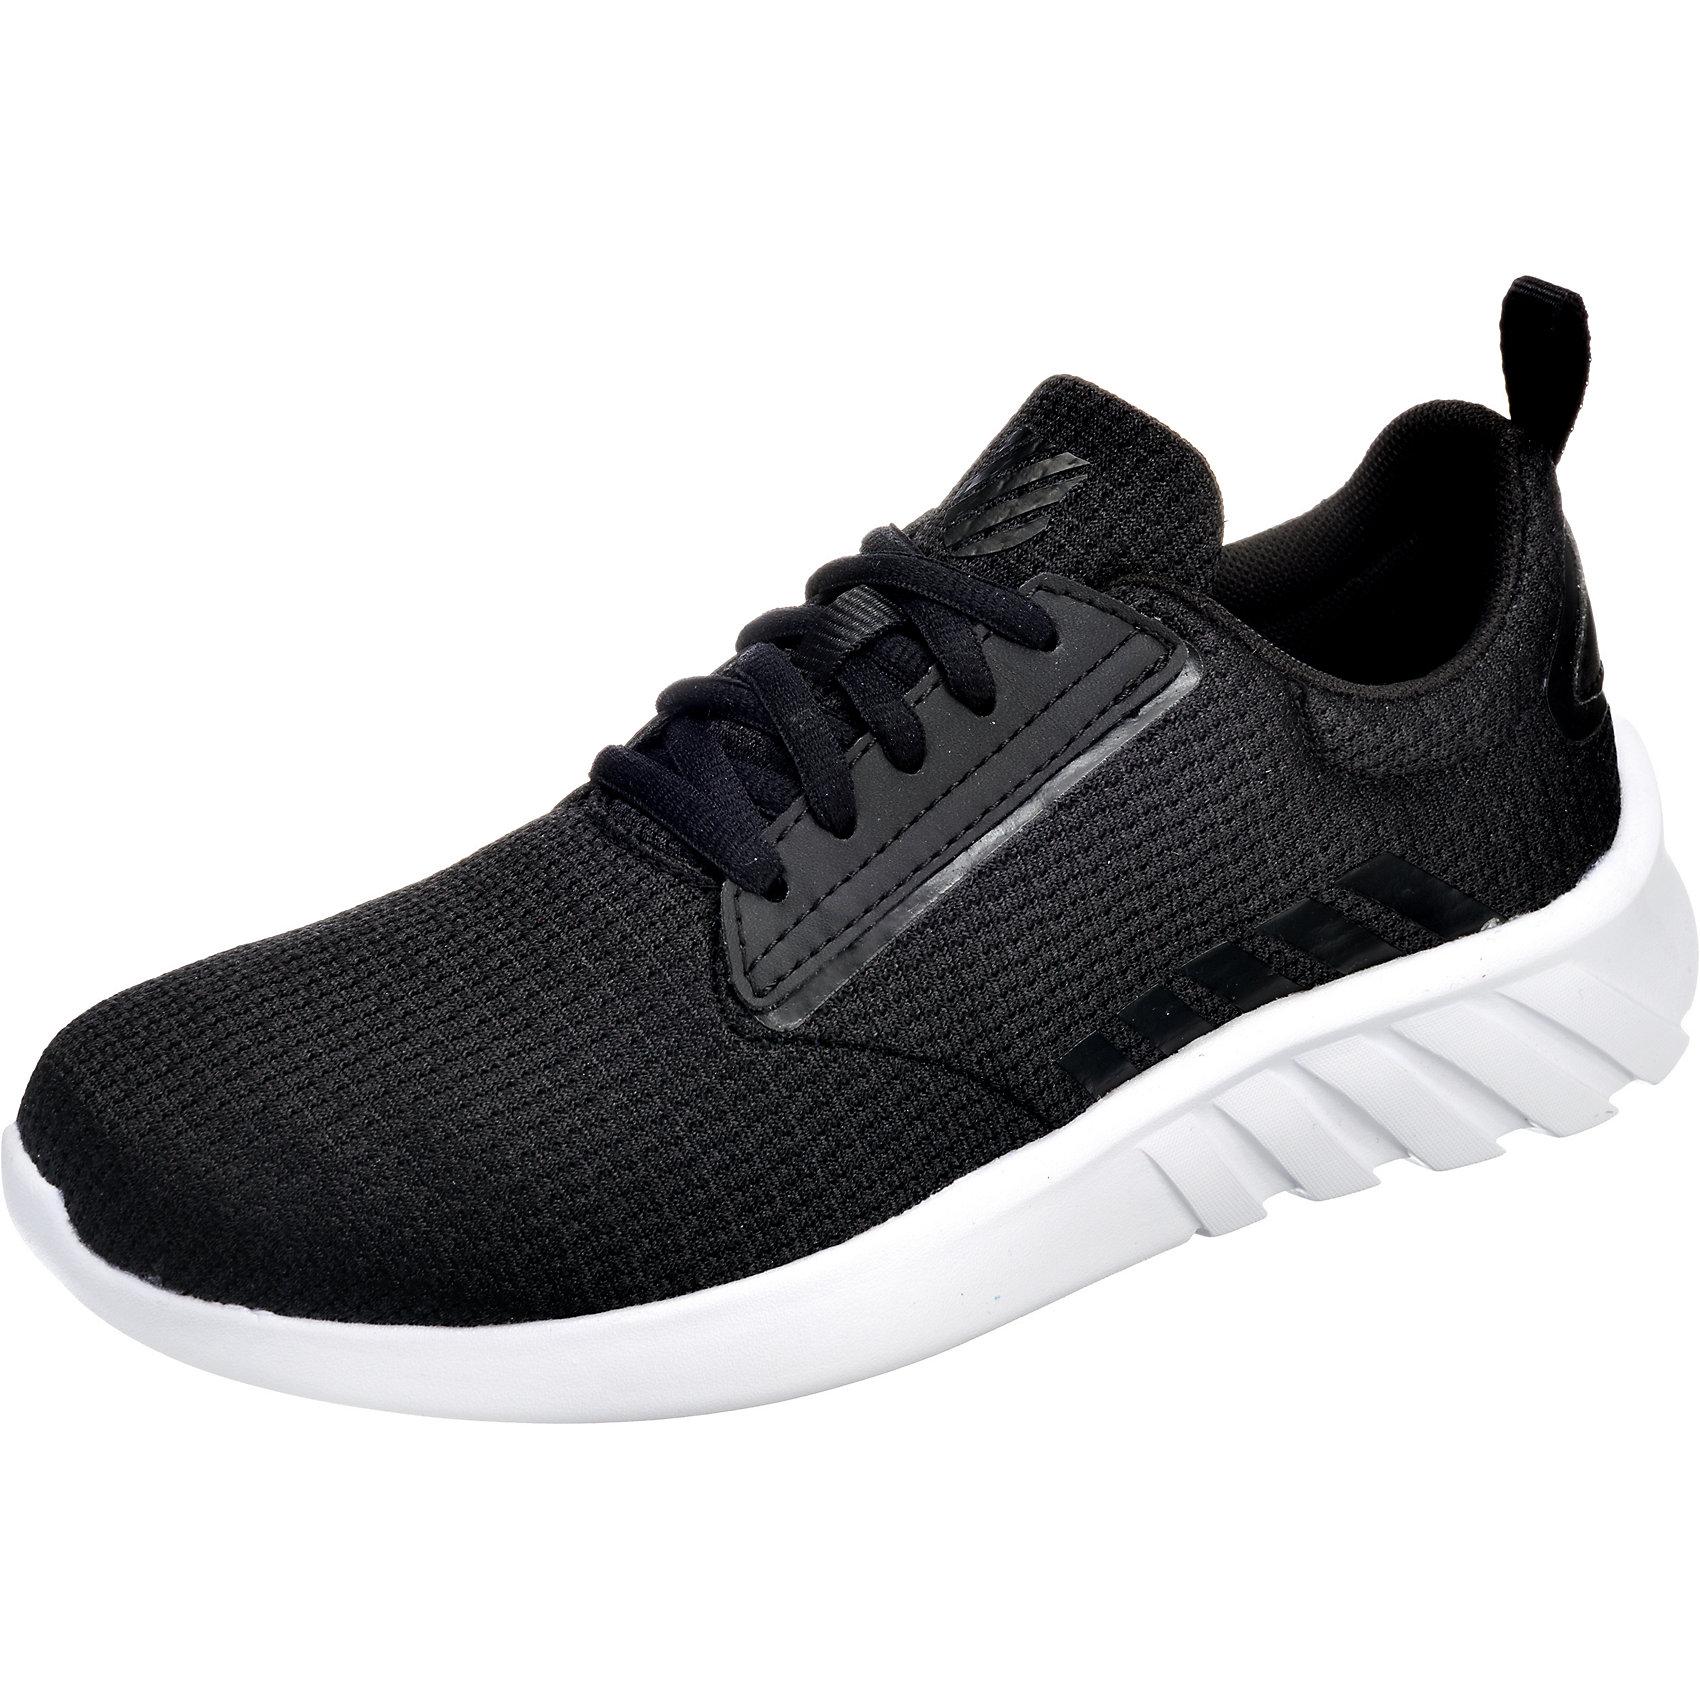 Neu Neu Neu K-SWISS Aeronaut Sneakers Niedrig 6830749 für Damen schwarz 805a2d